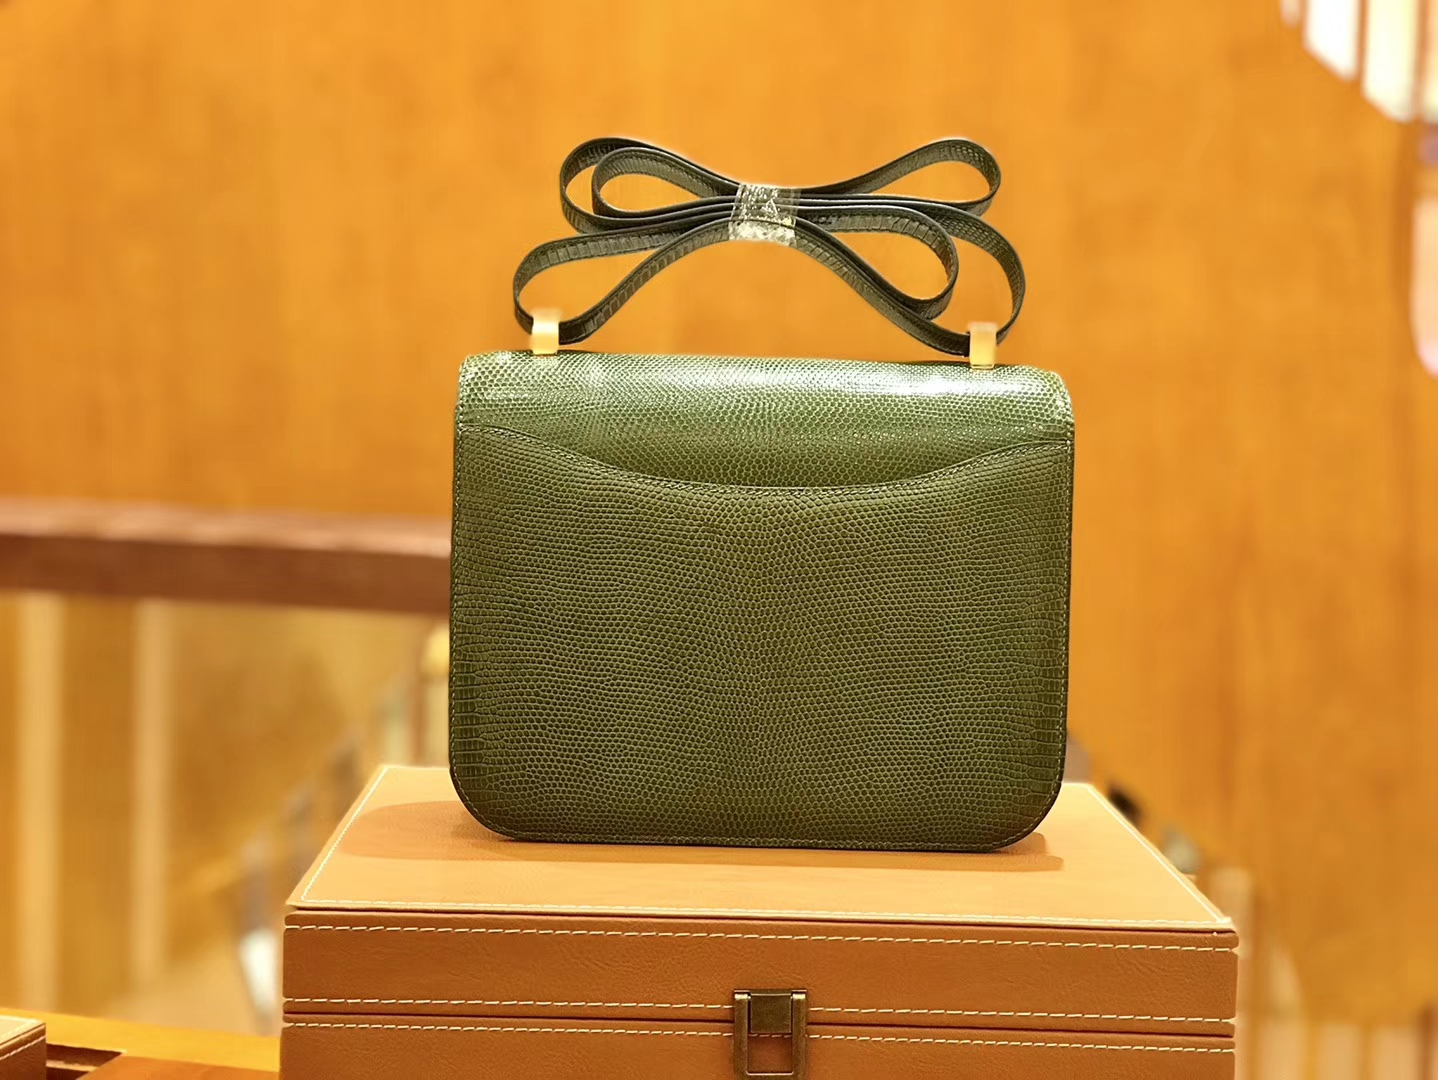 Hermès(爱马仕)Constance 空姐包 蜥蜴皮 橄榄绿 24cm